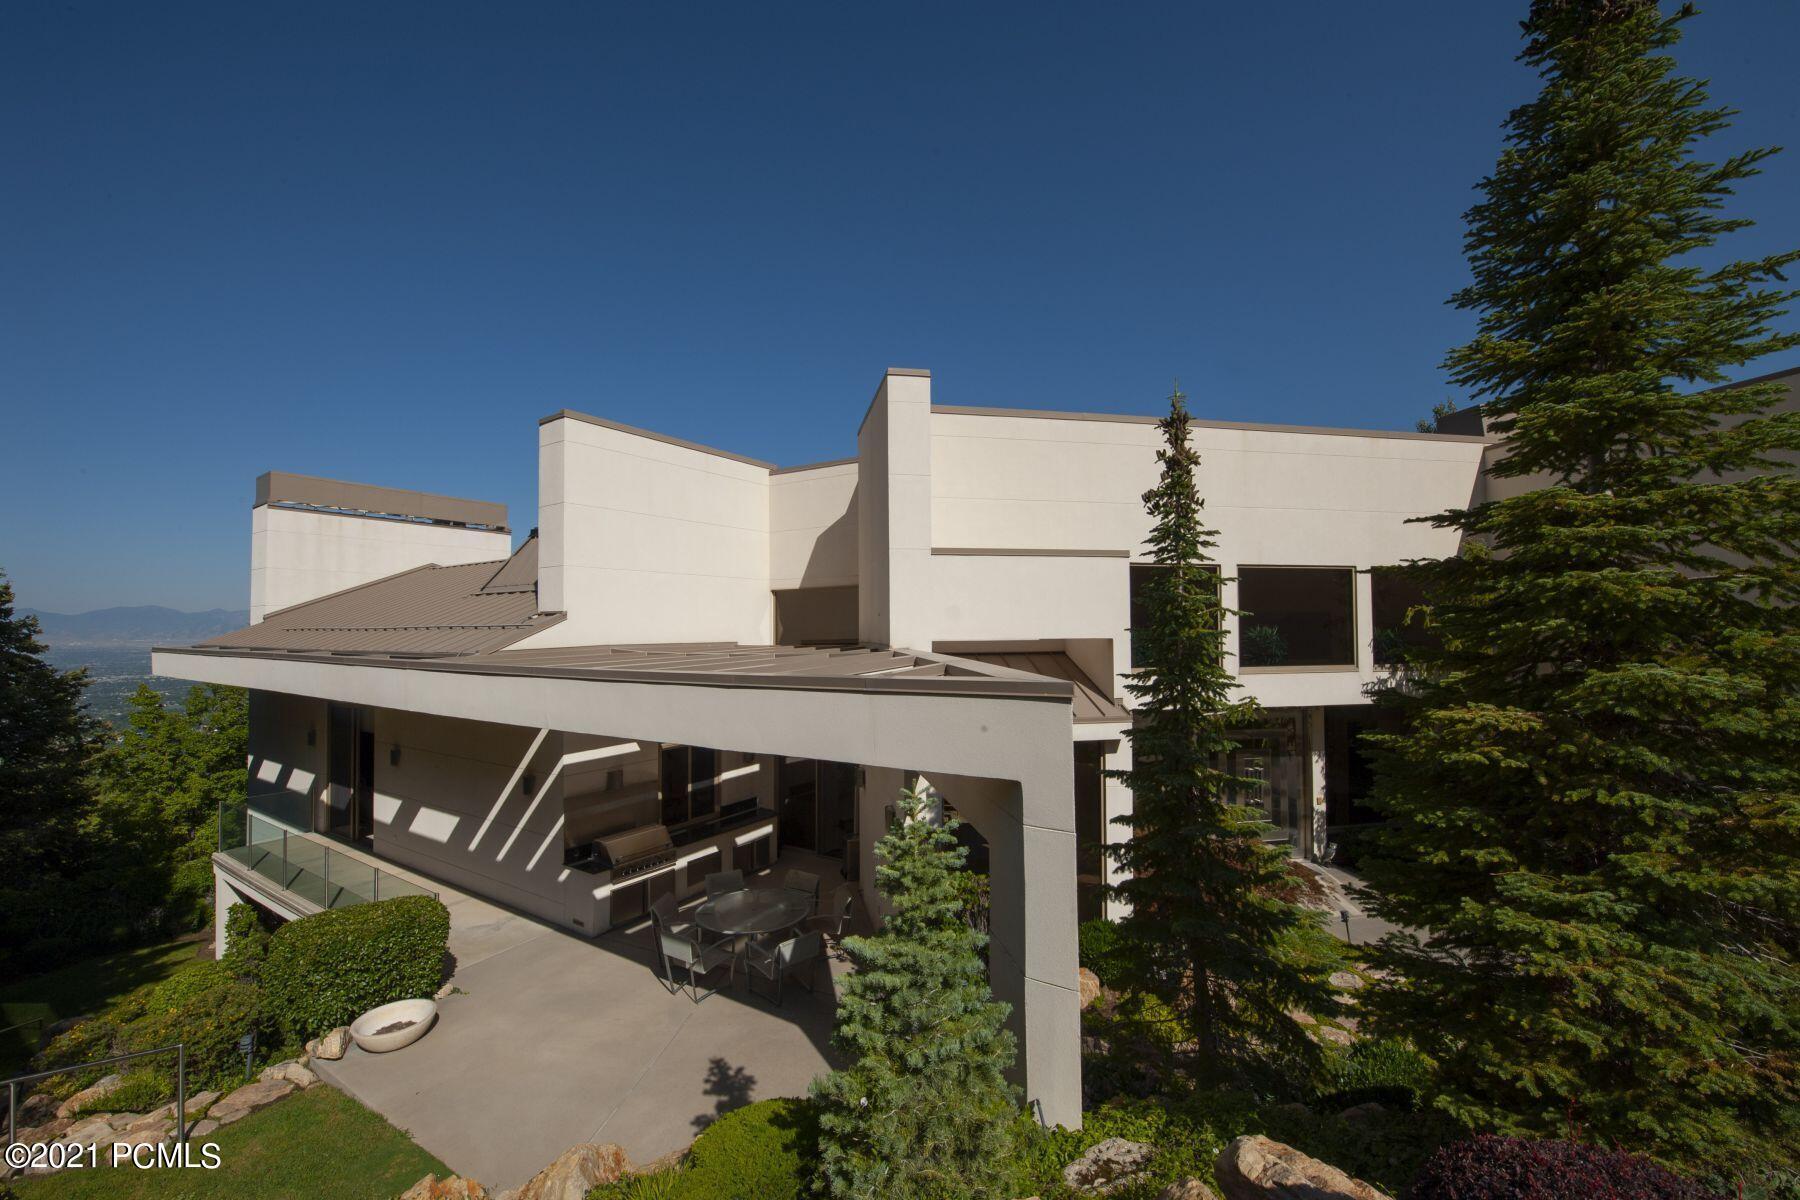 4544 Abinadi Road, Salt Lake City, Utah 84124, 4 Bedrooms Bedrooms, ,4 BathroomsBathrooms,Single Family,For Sale,Abinadi,12103382